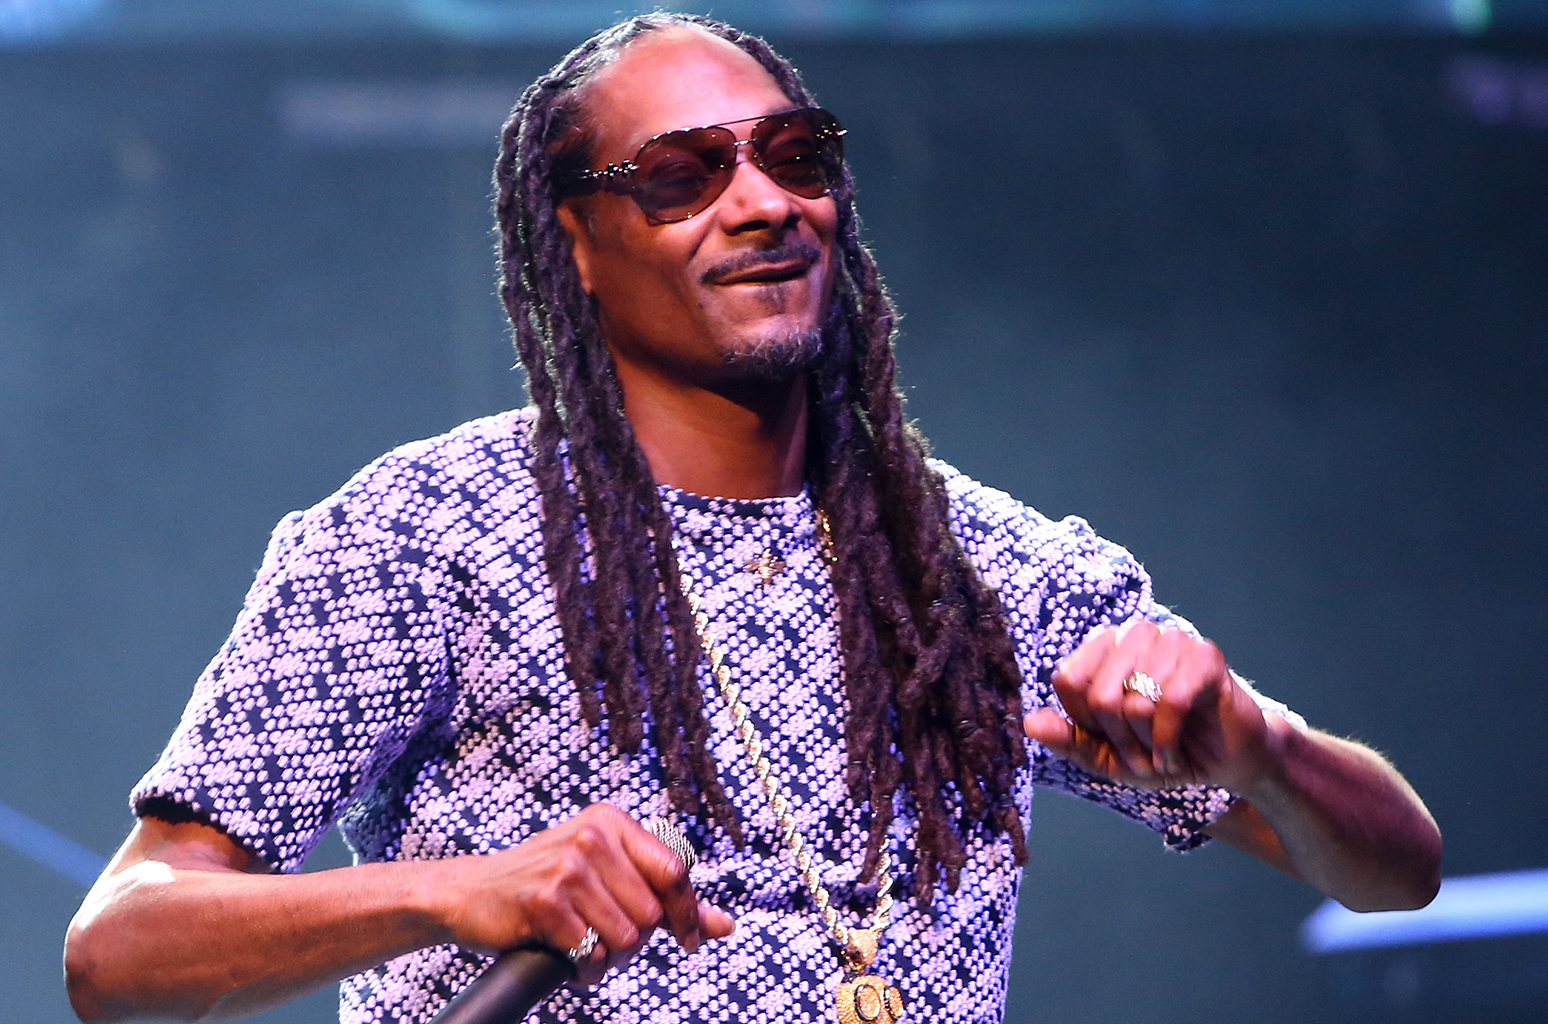 Snoop Dogg Rutgers University